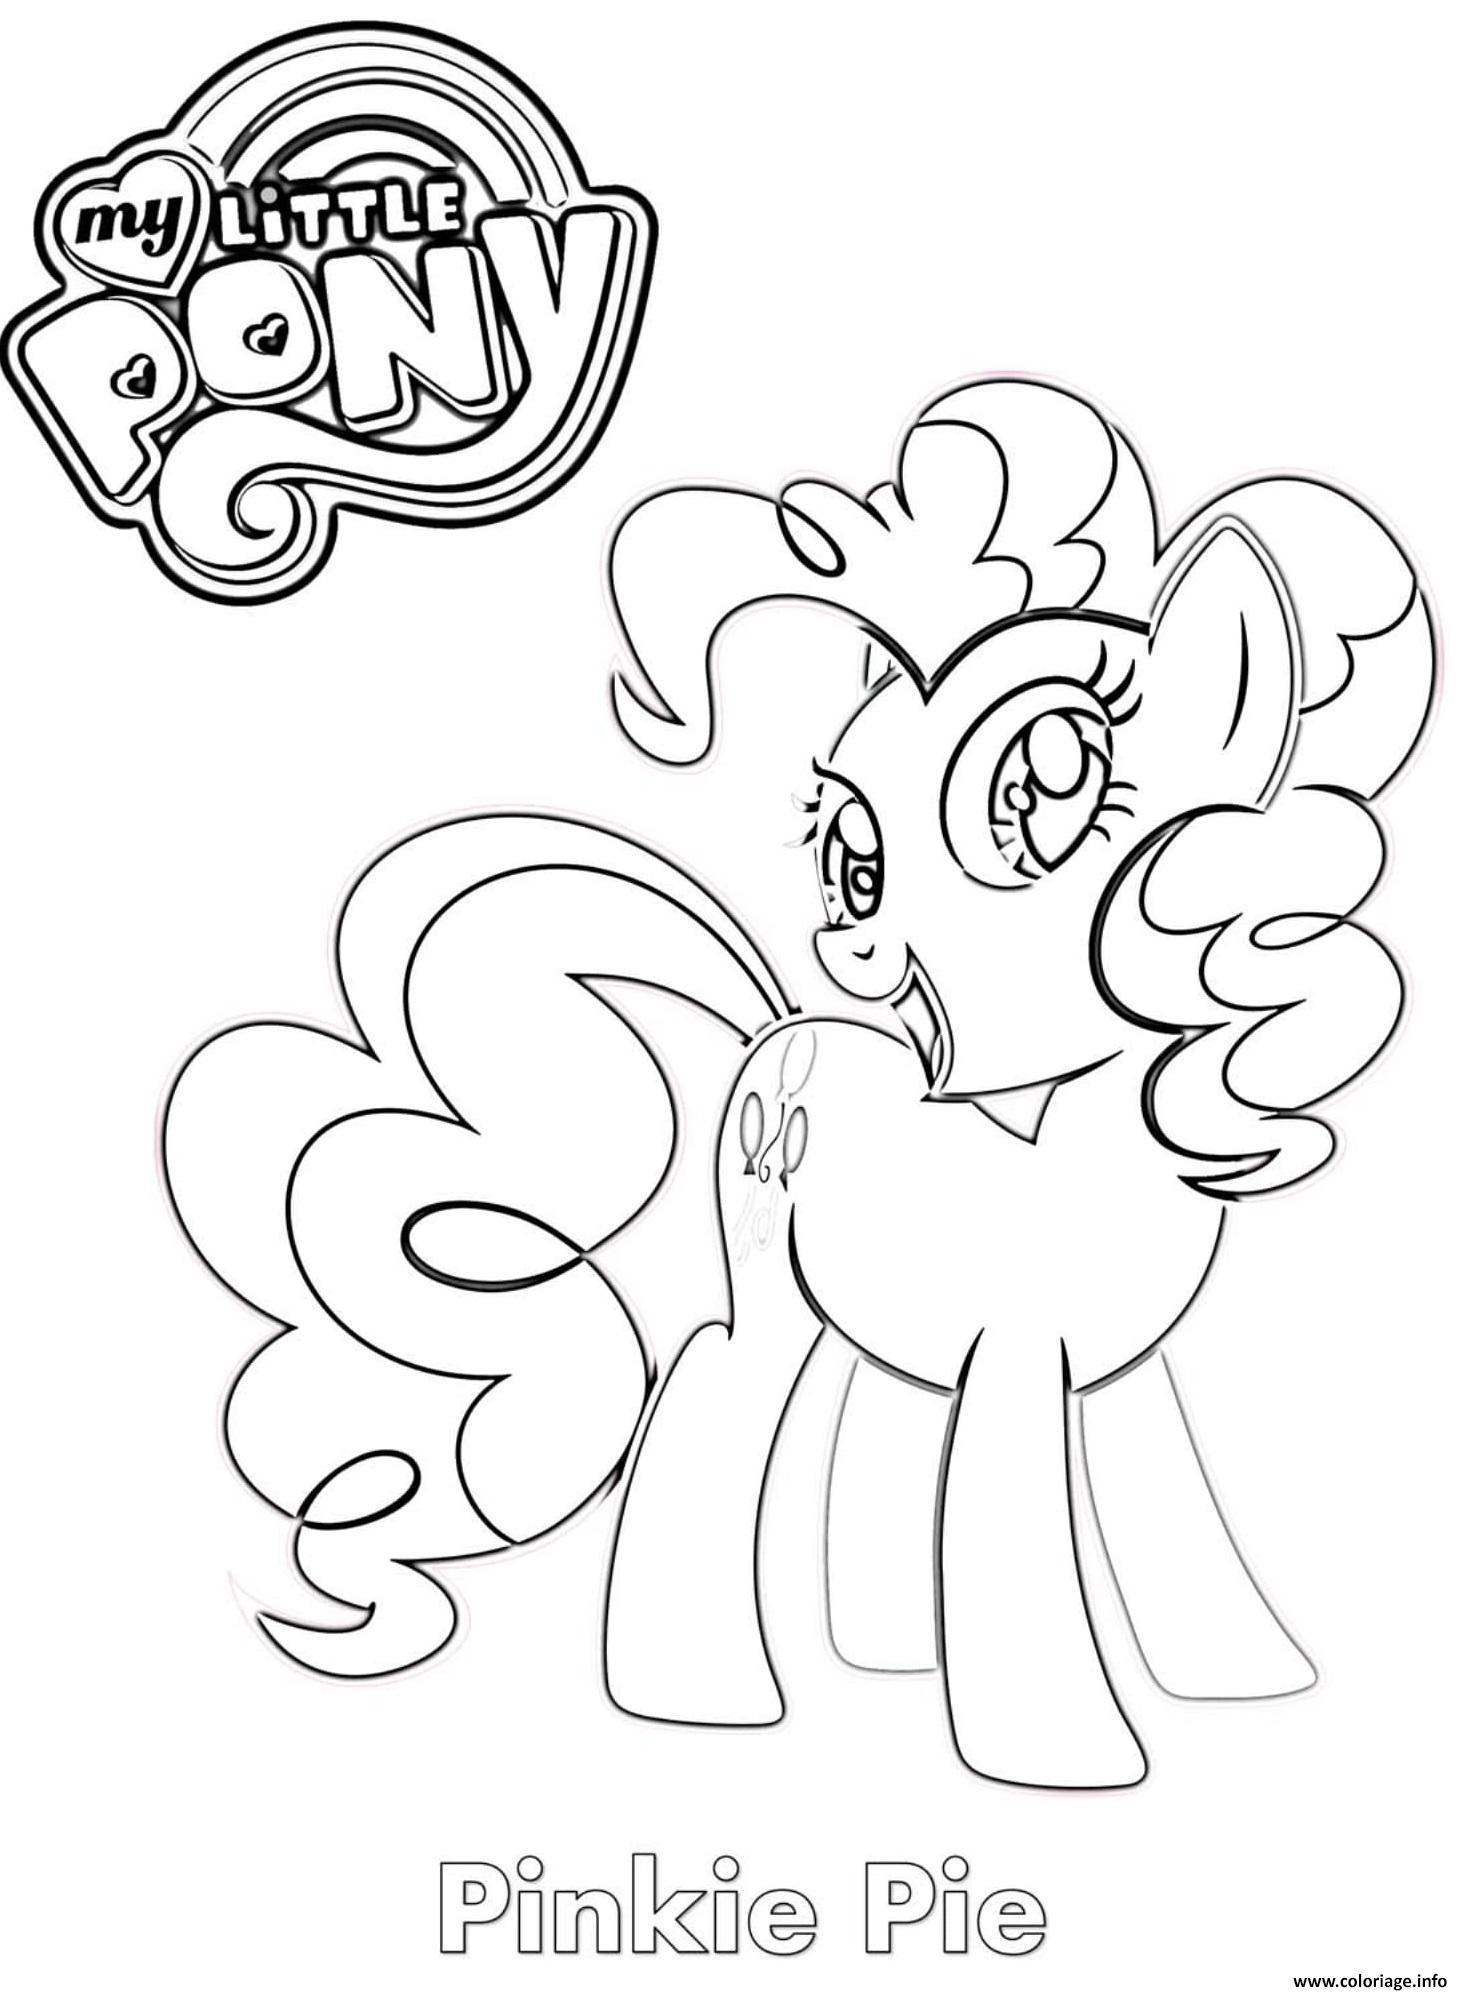 Coloriage Pinkie Pie MLP - JeColorie.com